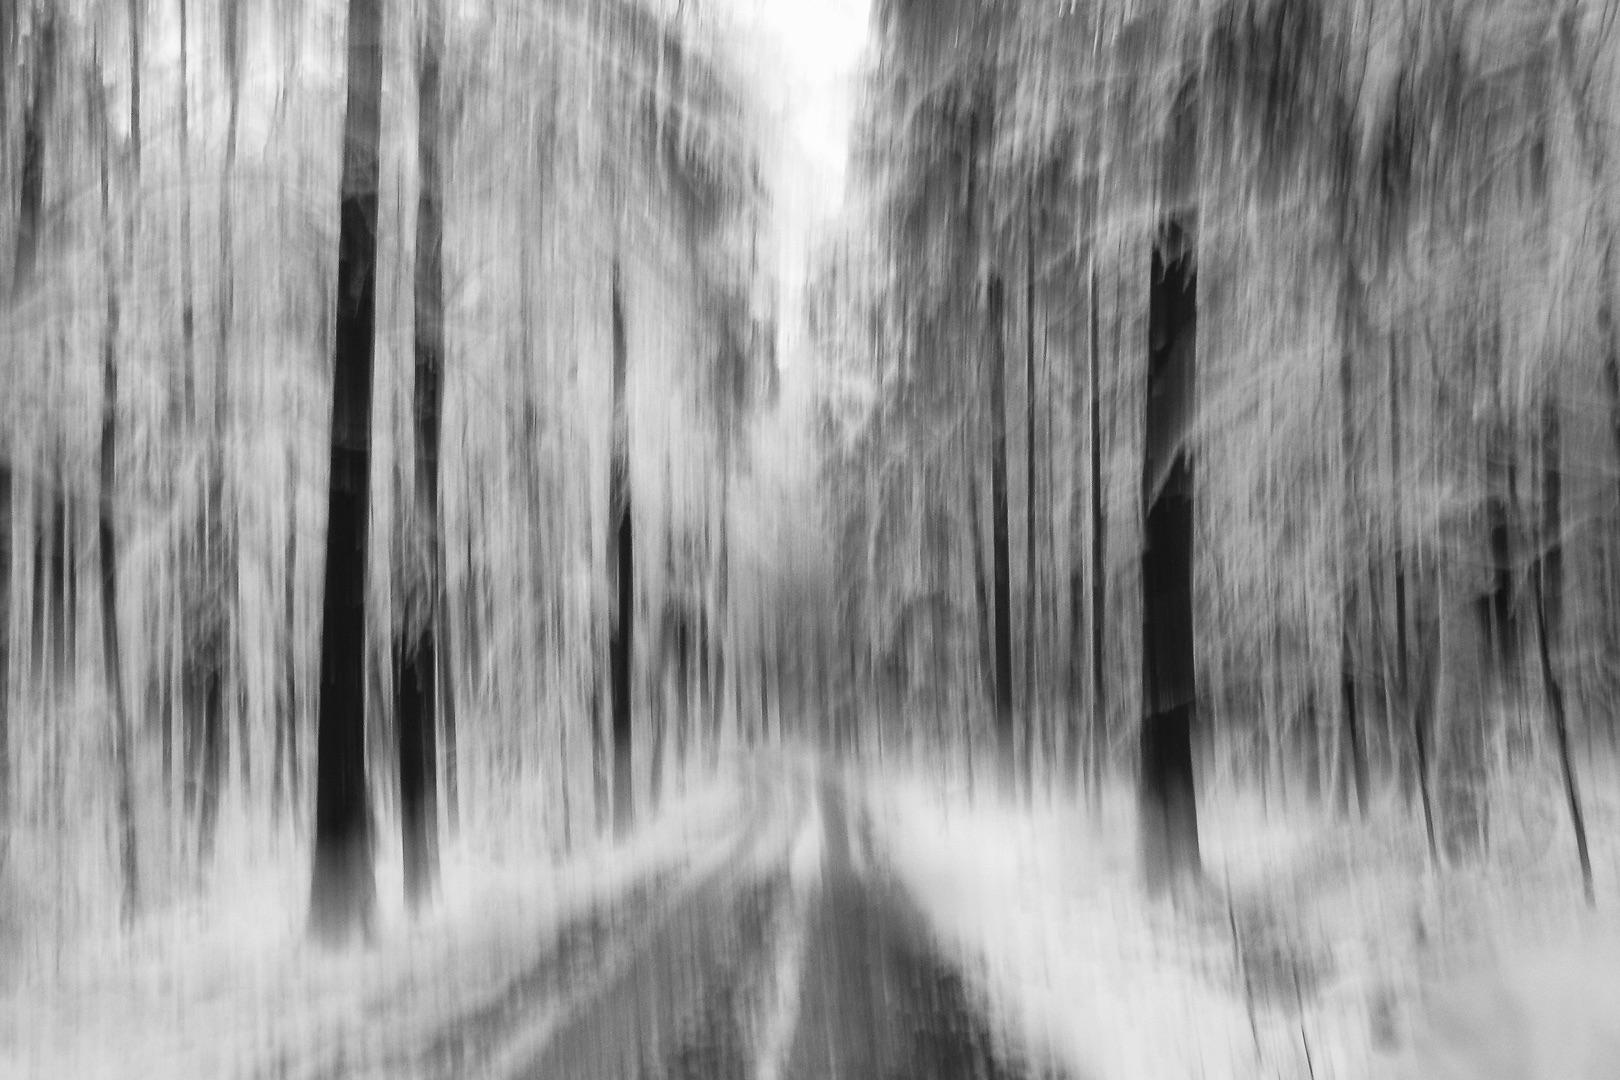 Karl-Heinz Link, Winterwald